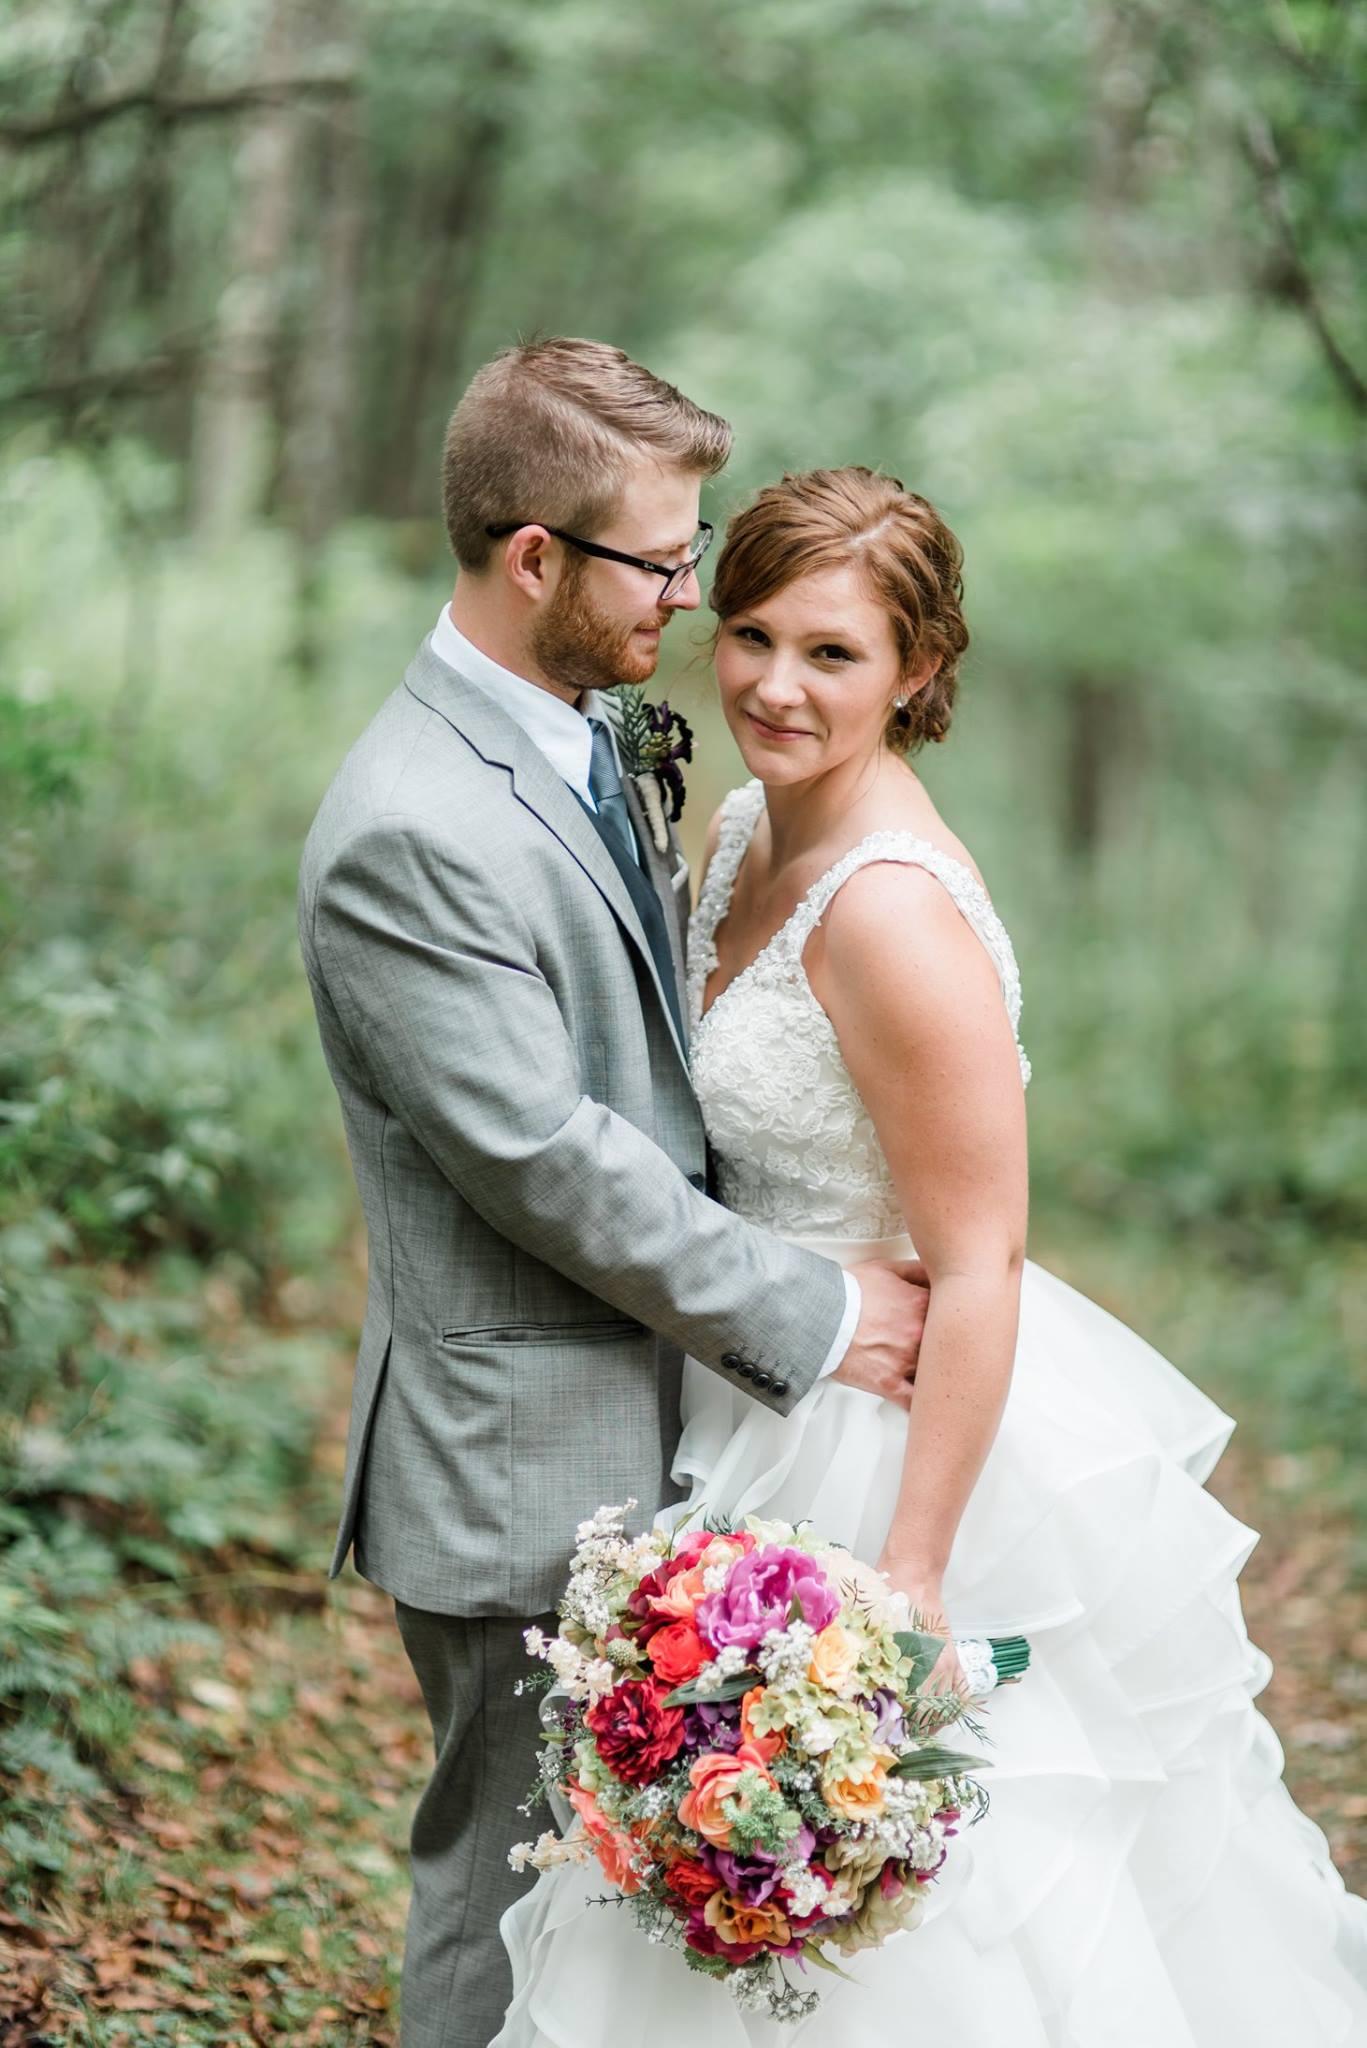 pennsylvania-backyard-wedding-love-diy-bohemian-romantic-colorful-0022.jpg